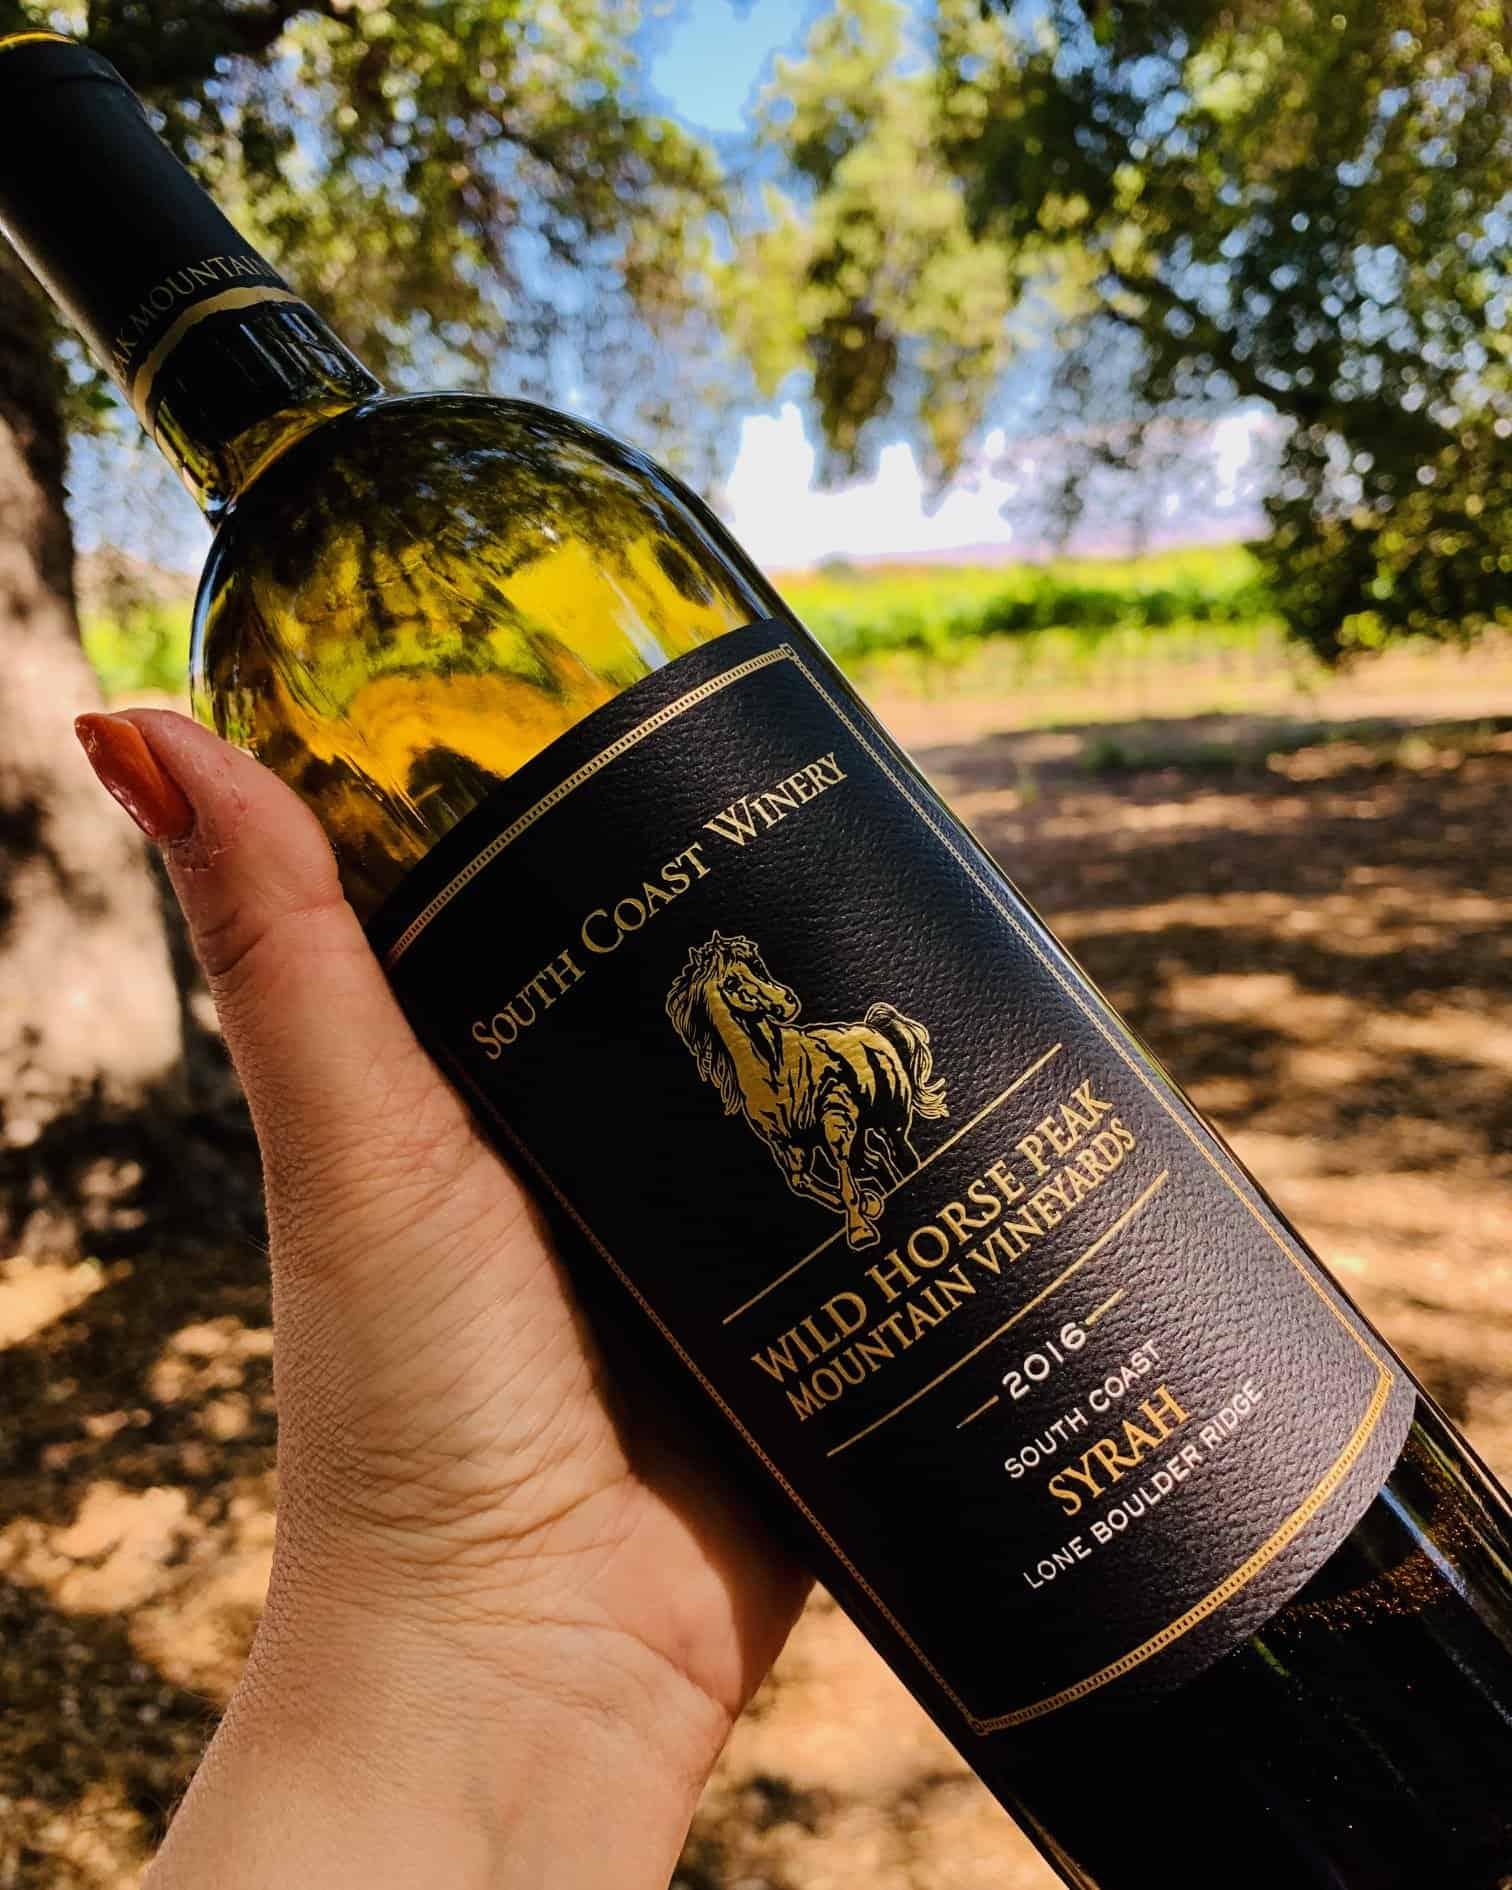 Temecula Wine Country South Coast Winery Wild House Peak Syrah 2016